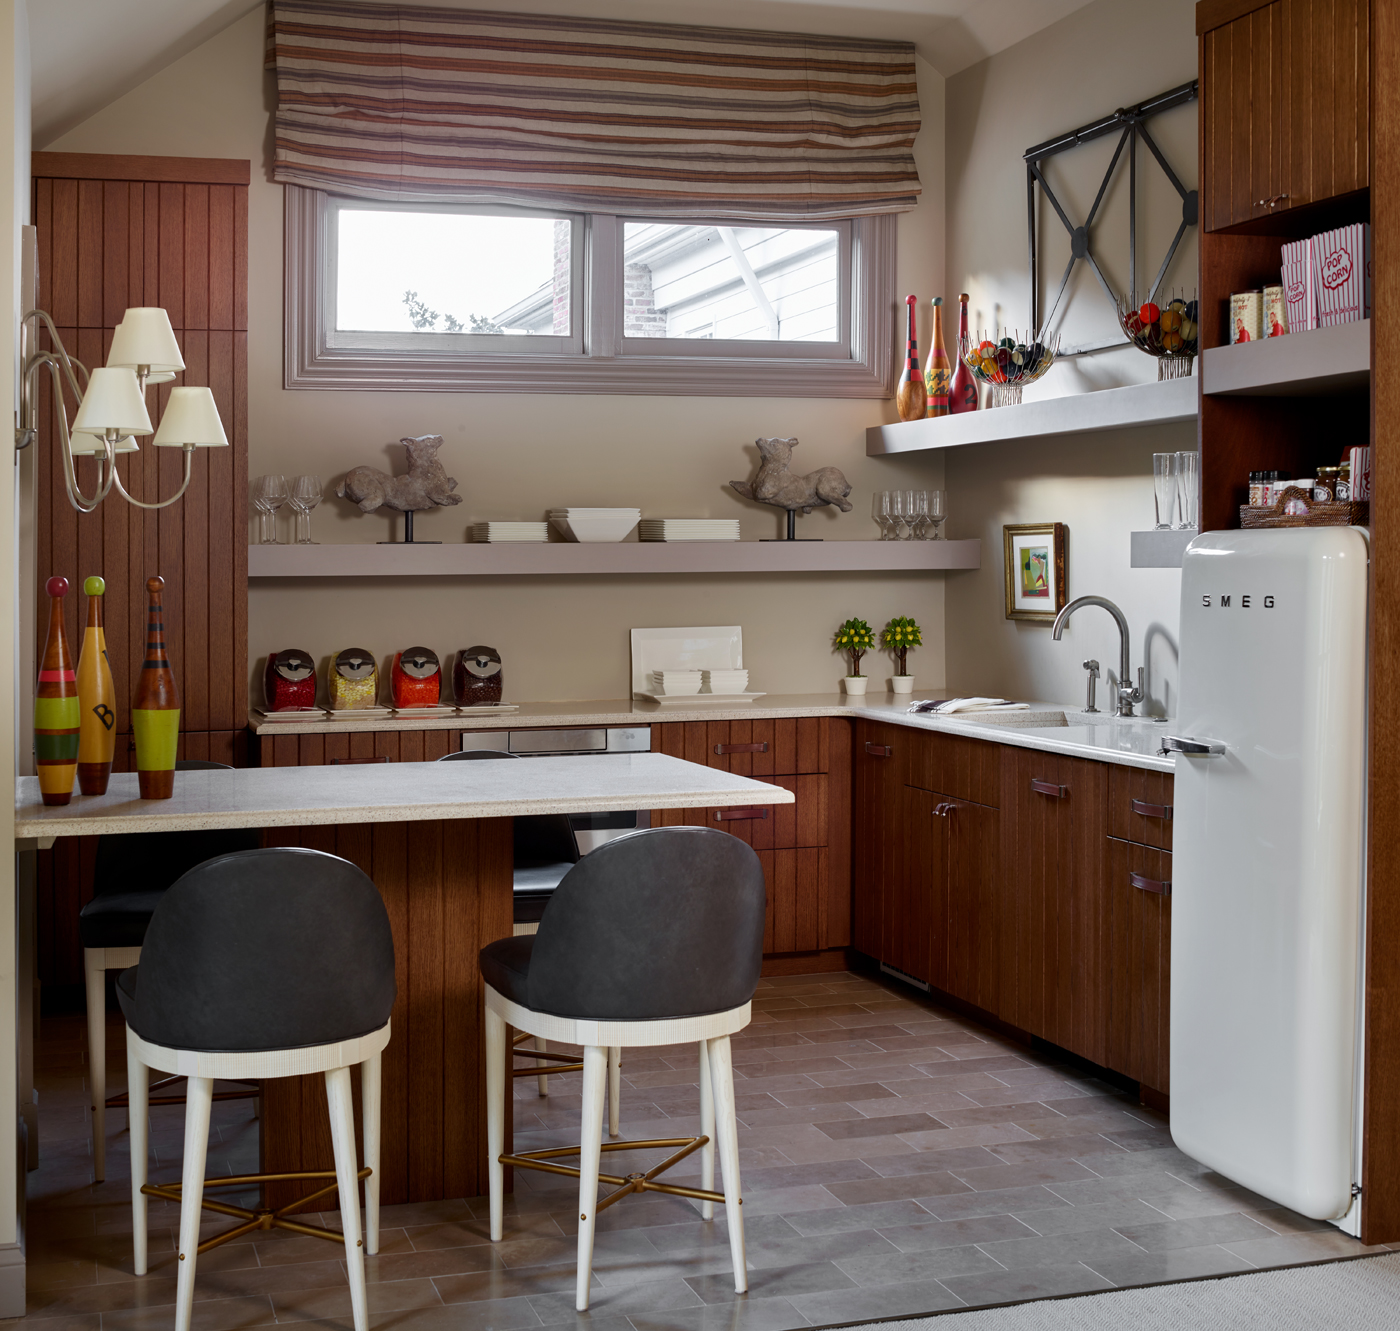 Modern kitchen with medium stained wood finish, counter stools, and retro Smeg refrigerator | Savage Interior Design